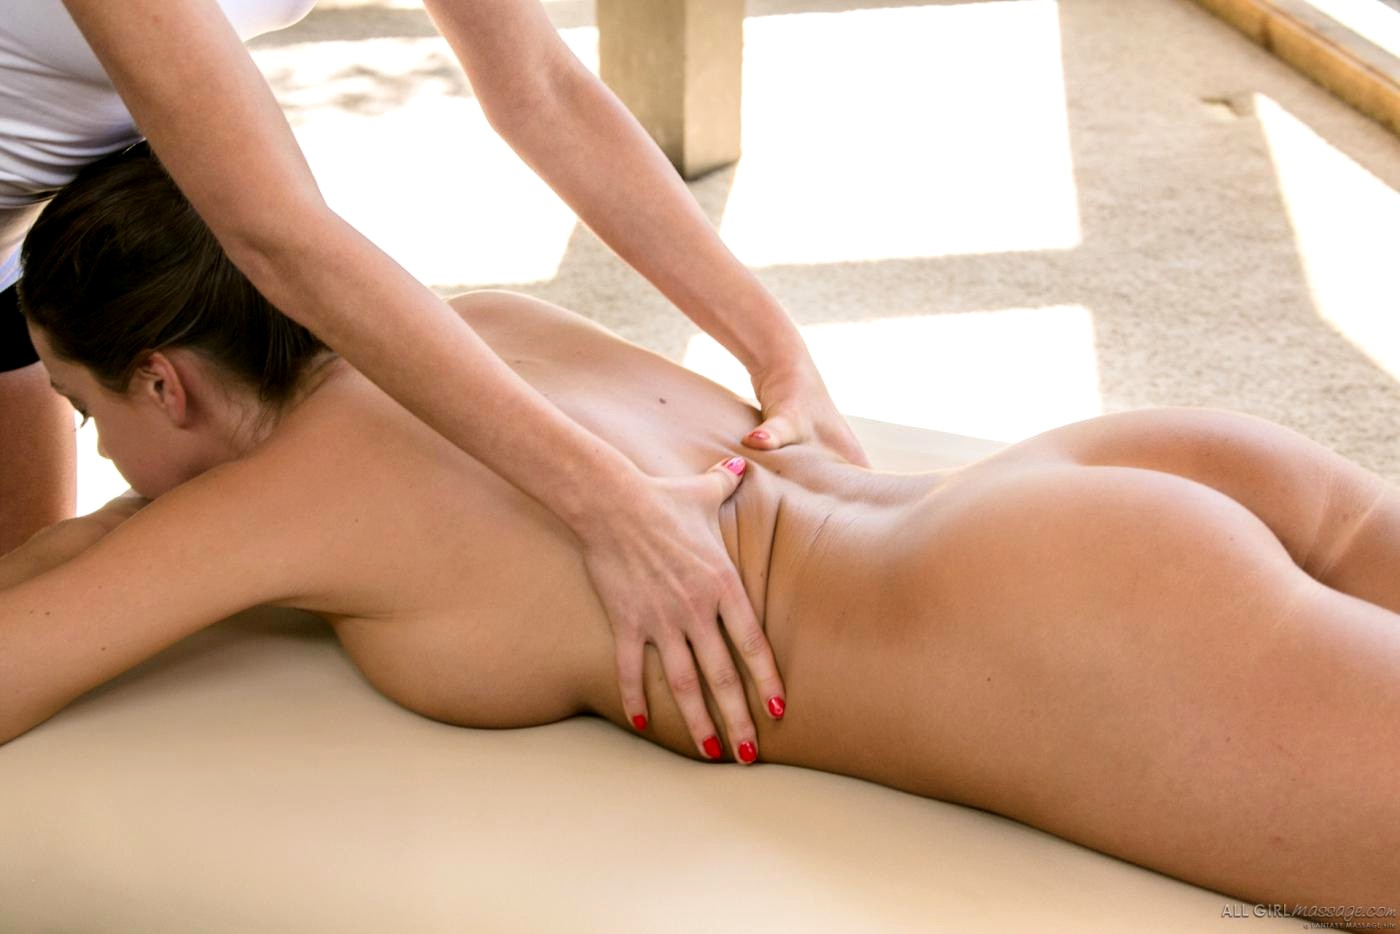 Sexiest lesbian girls massage their sexy bodies